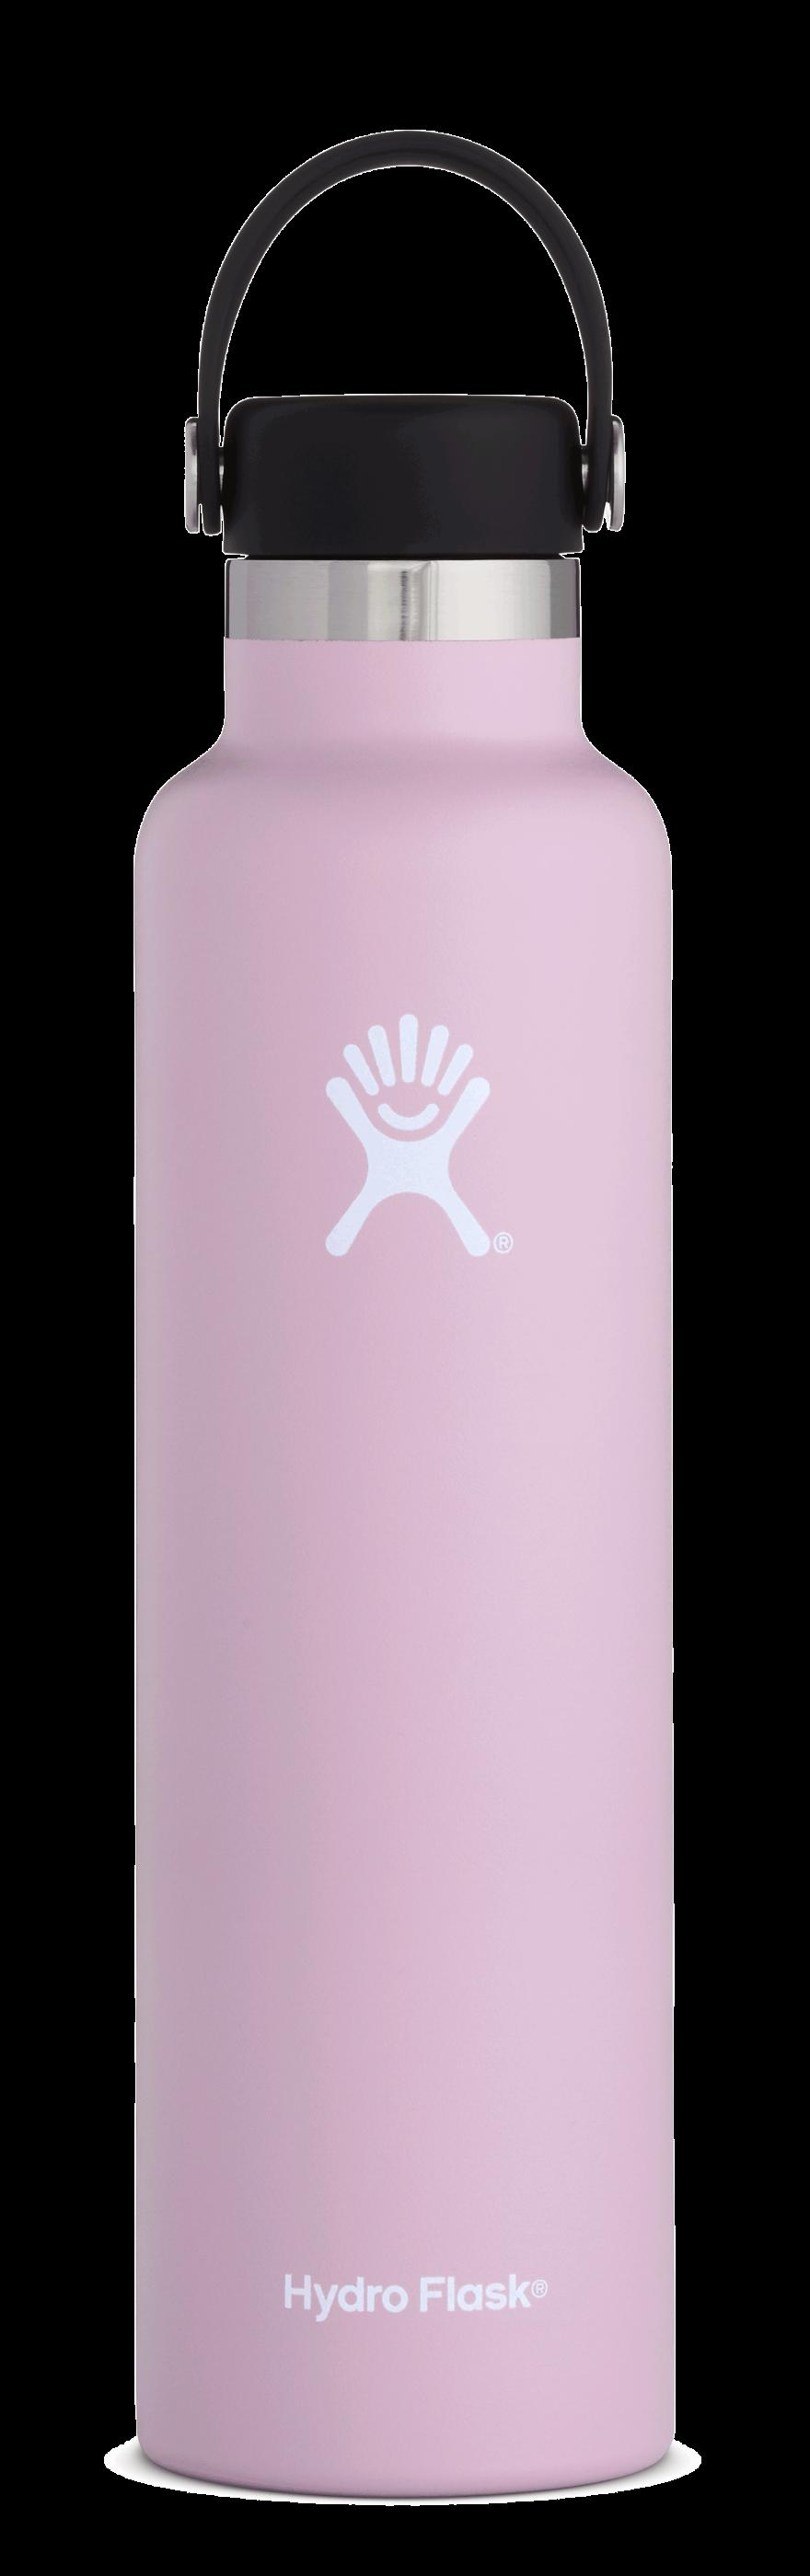 Hydro-Flask-24-oz-Standard-Mouth-Lilac